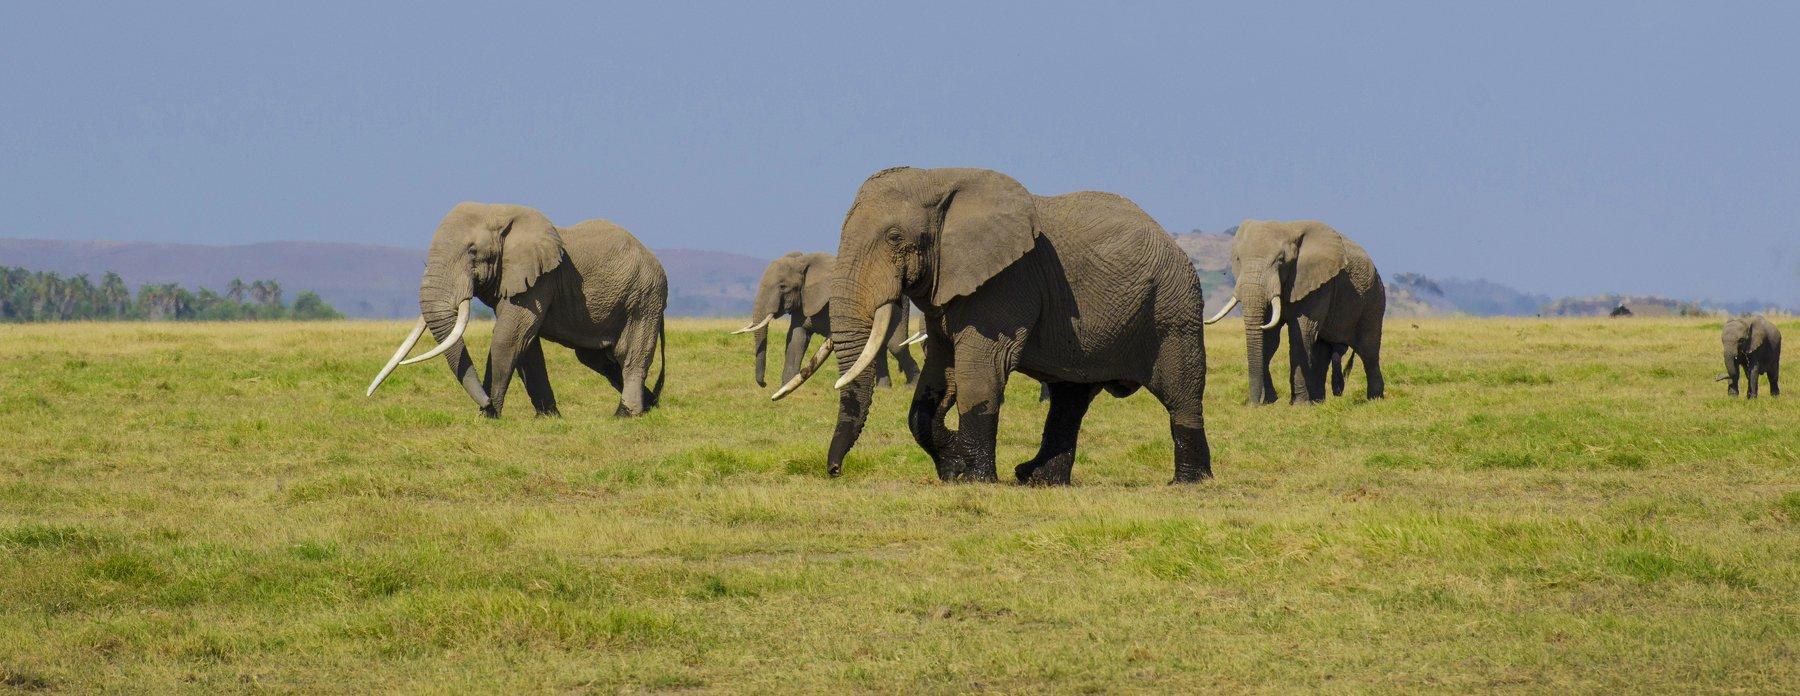 Слоны, саванна, сафари, Марина Мудрова